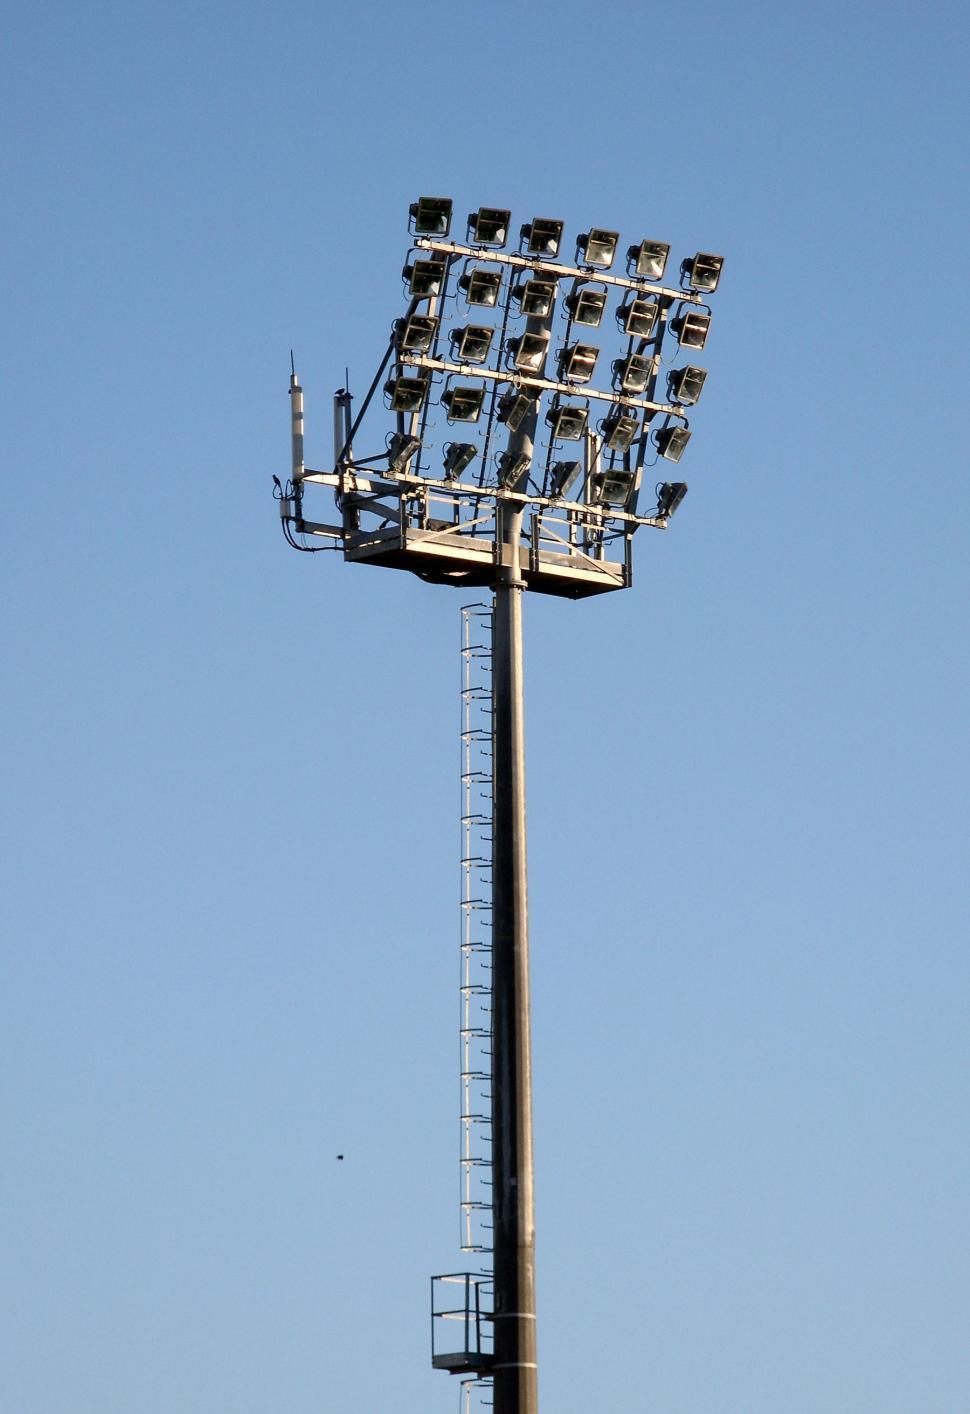 Download Free Stock HD Photo of Stadium floodlights Online